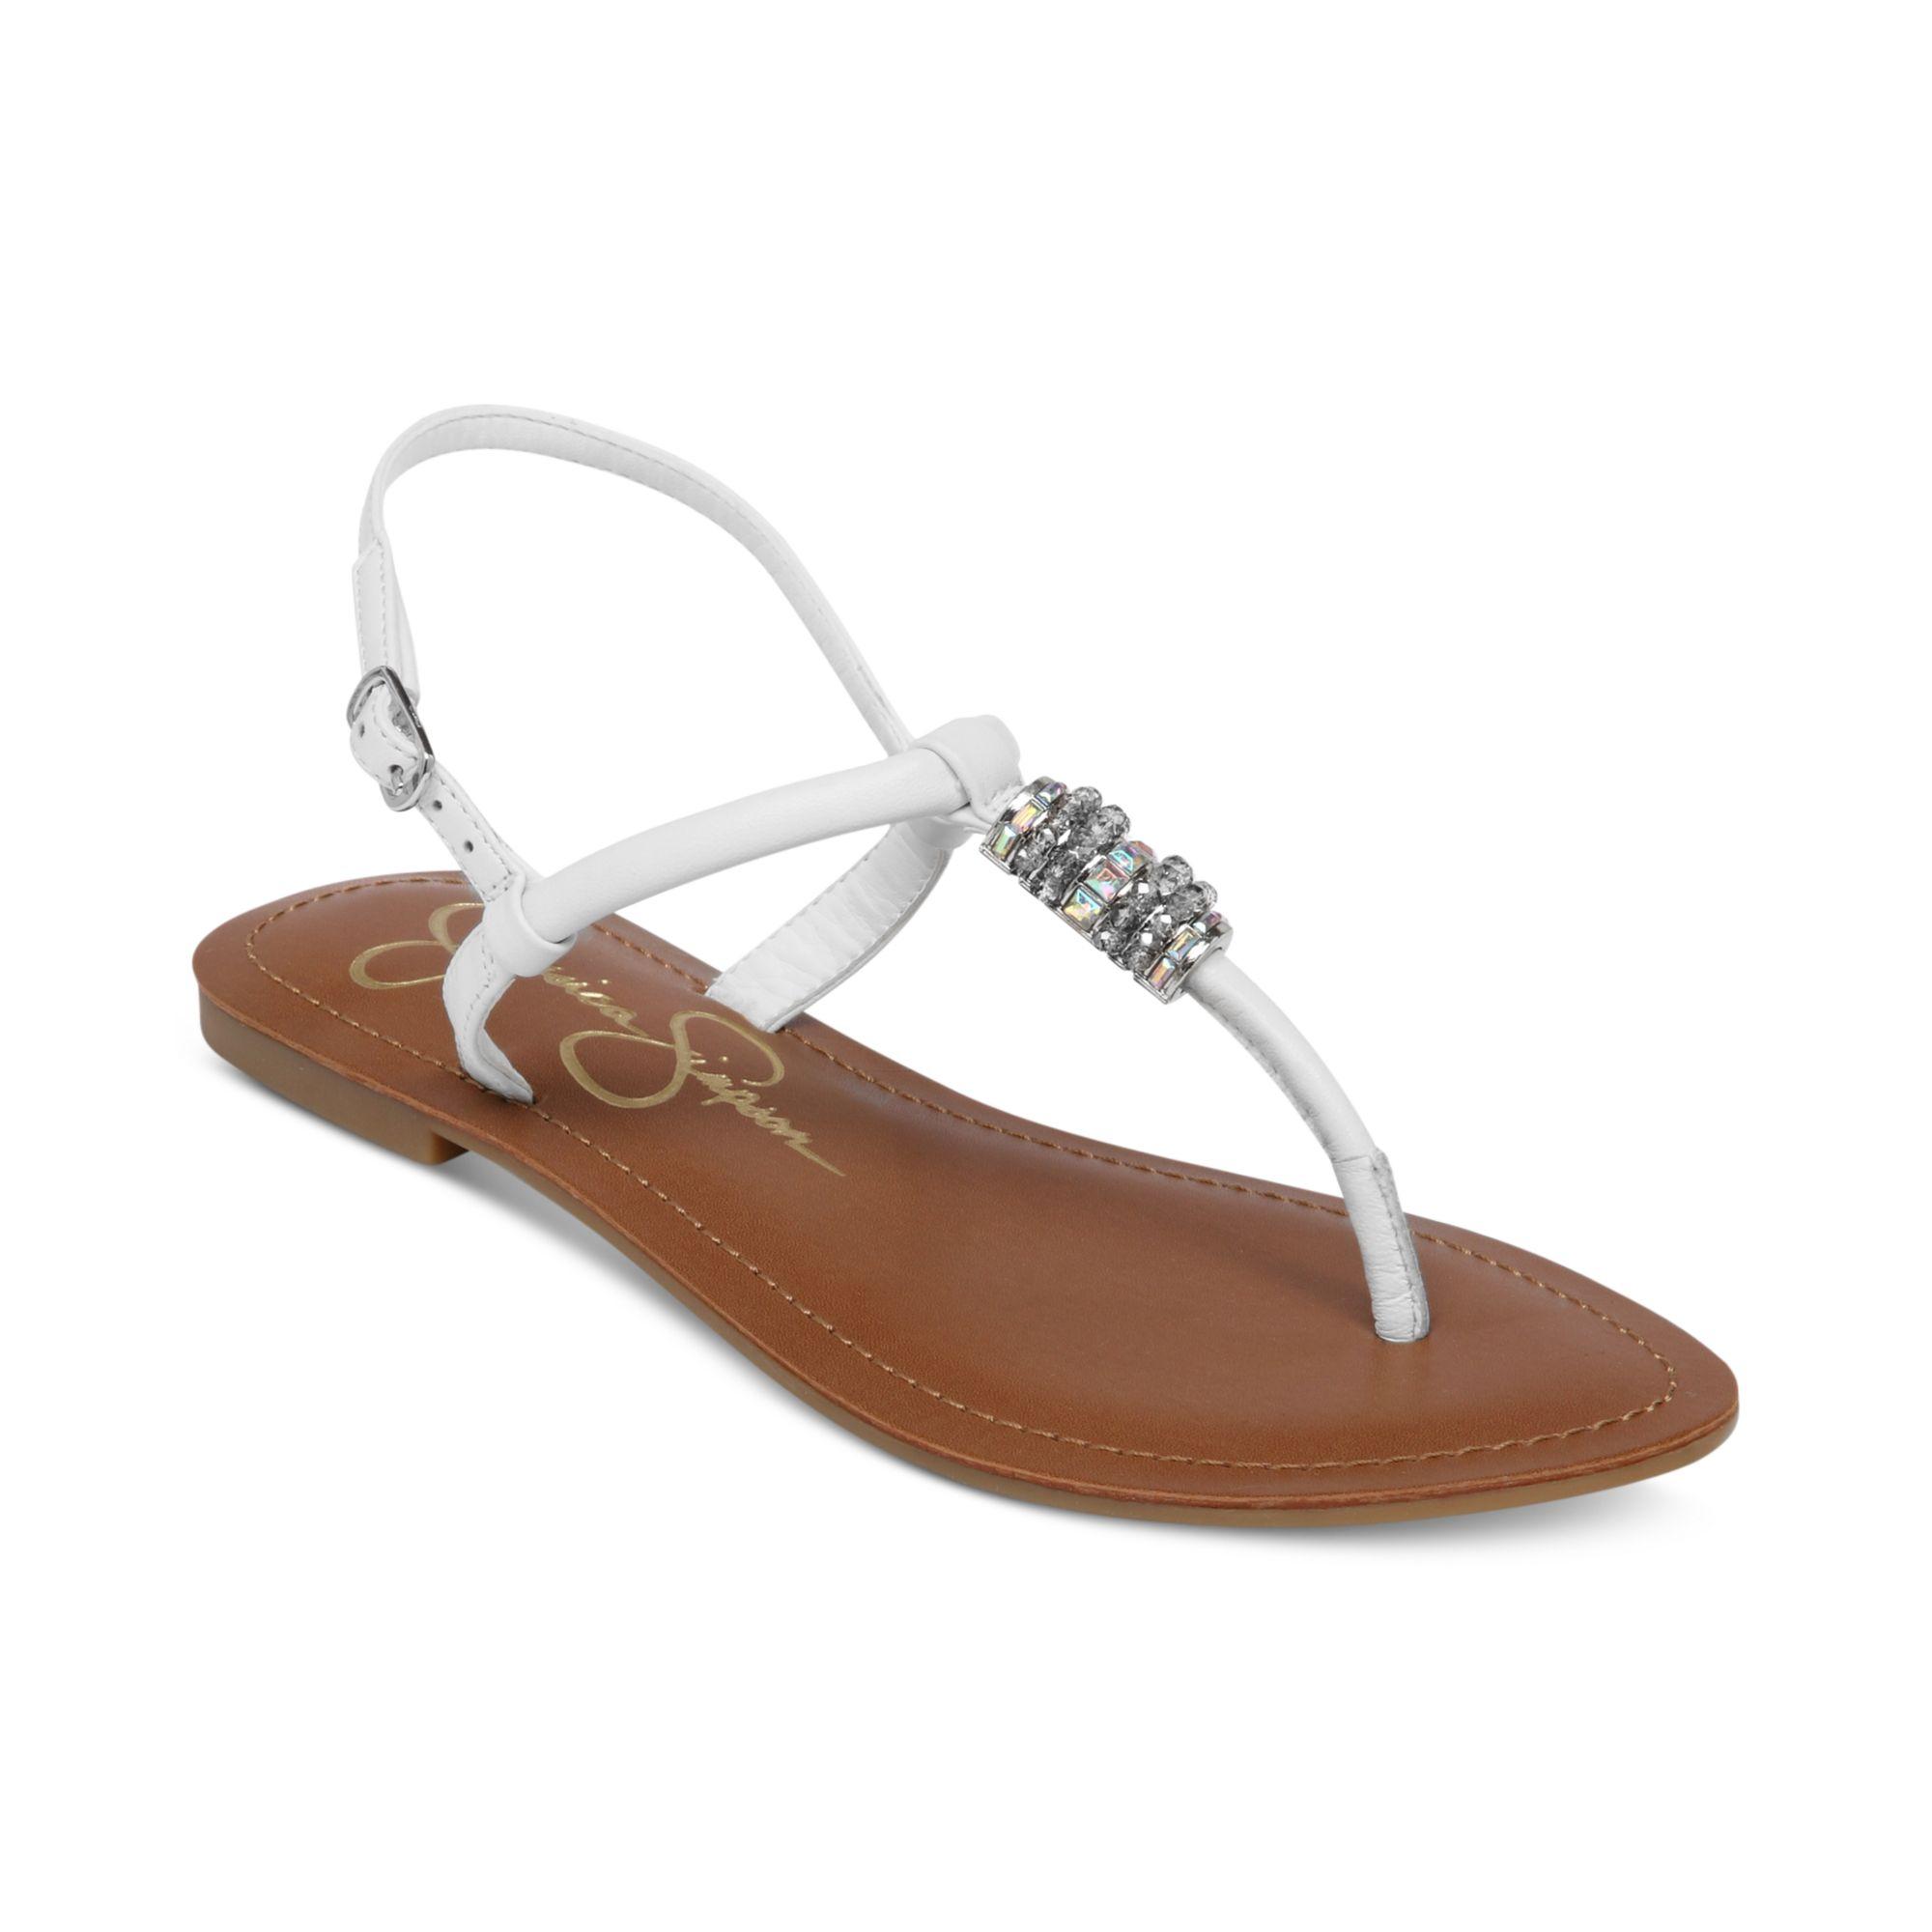 Lyst Jessica Simpson Regattah Flat Thong Sandals In White